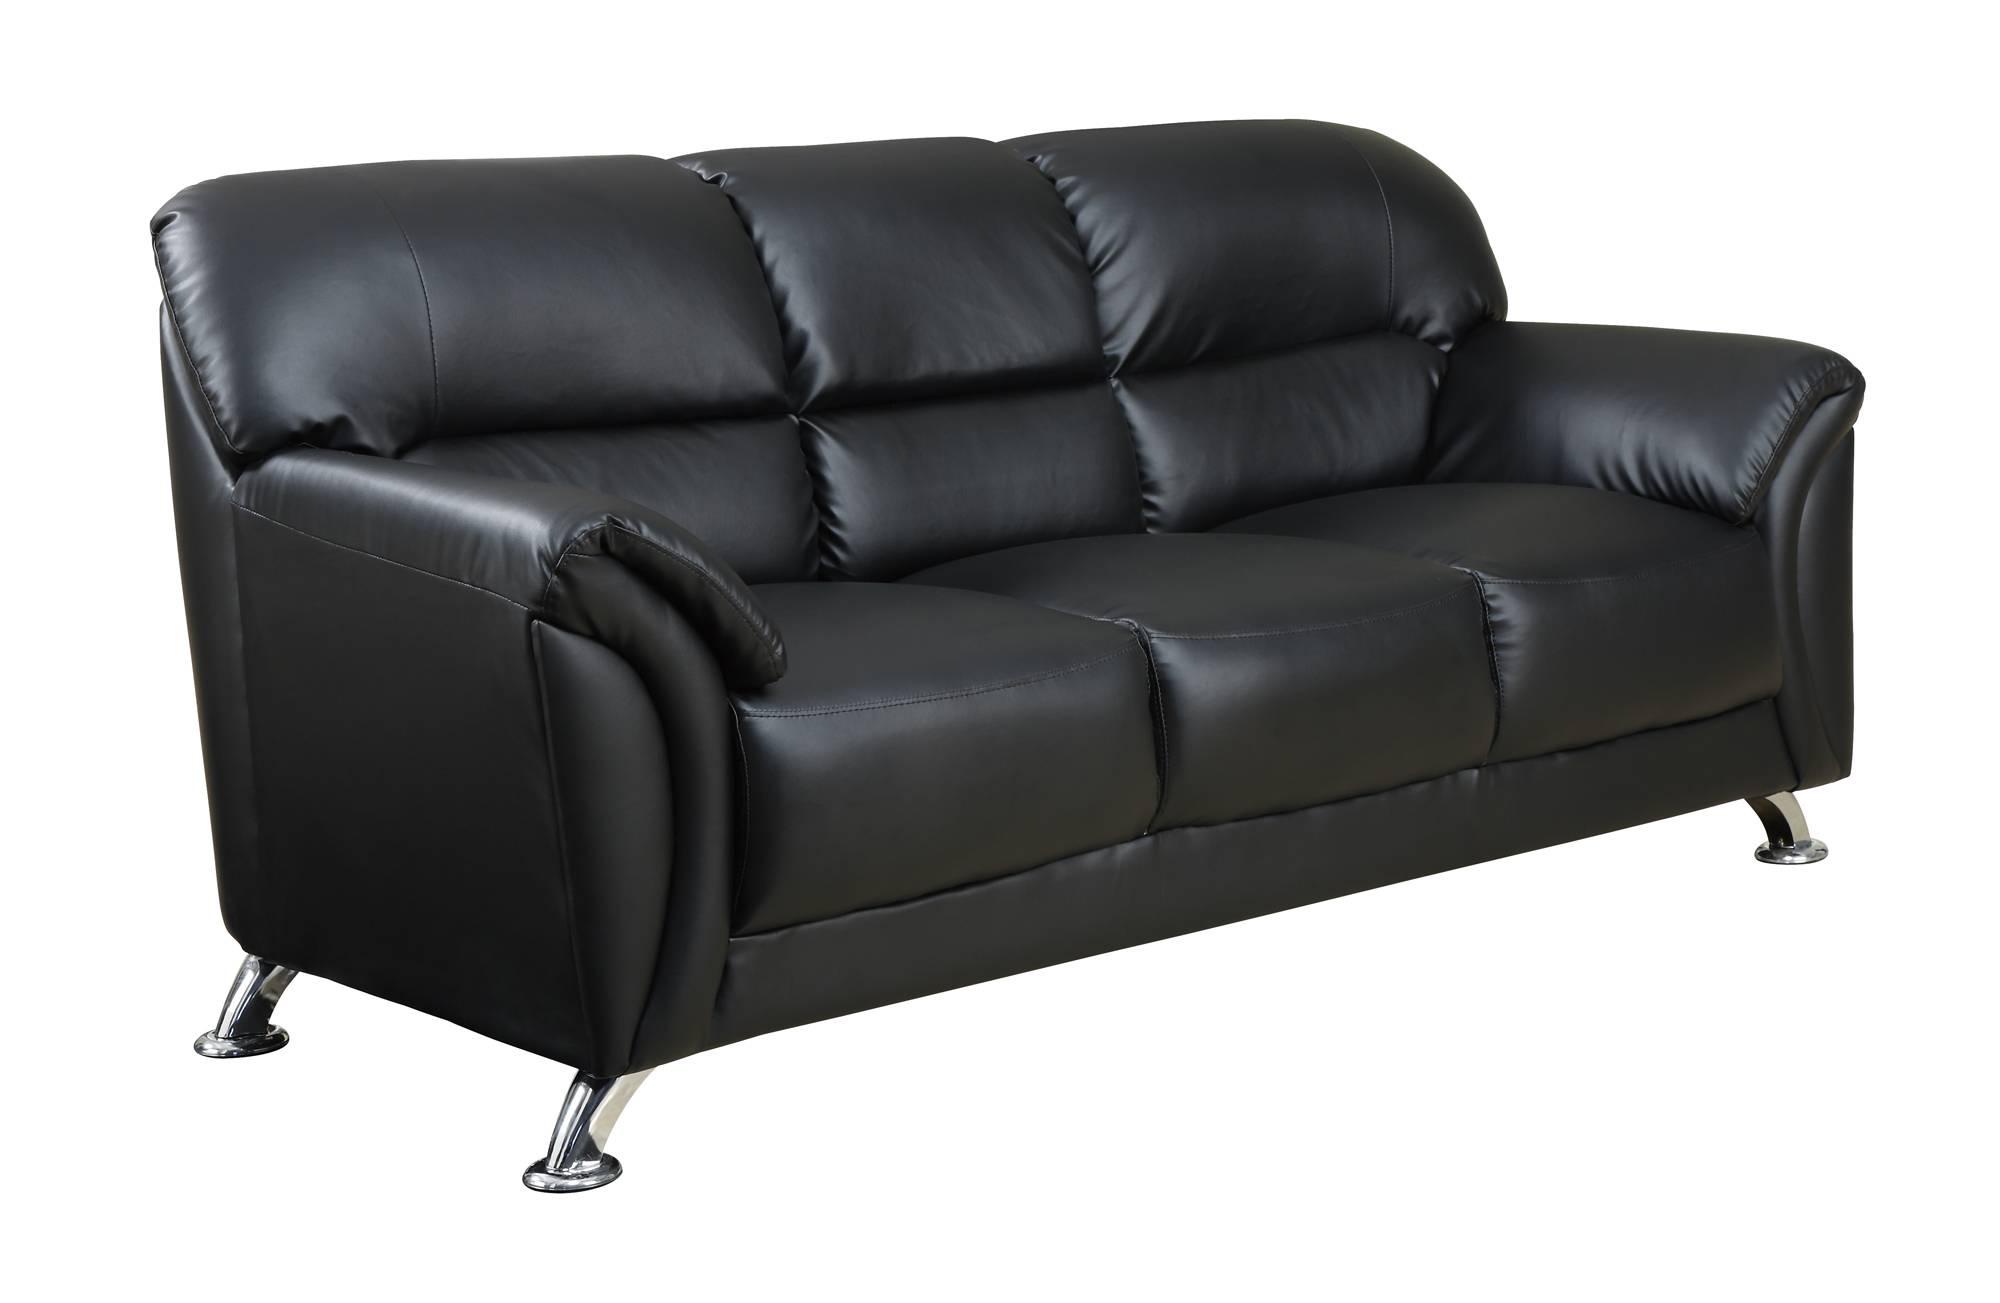 U9103 Black Vinyl Sofaglobal Furniture inside Black Vinyl Sofas (Image 14 of 15)